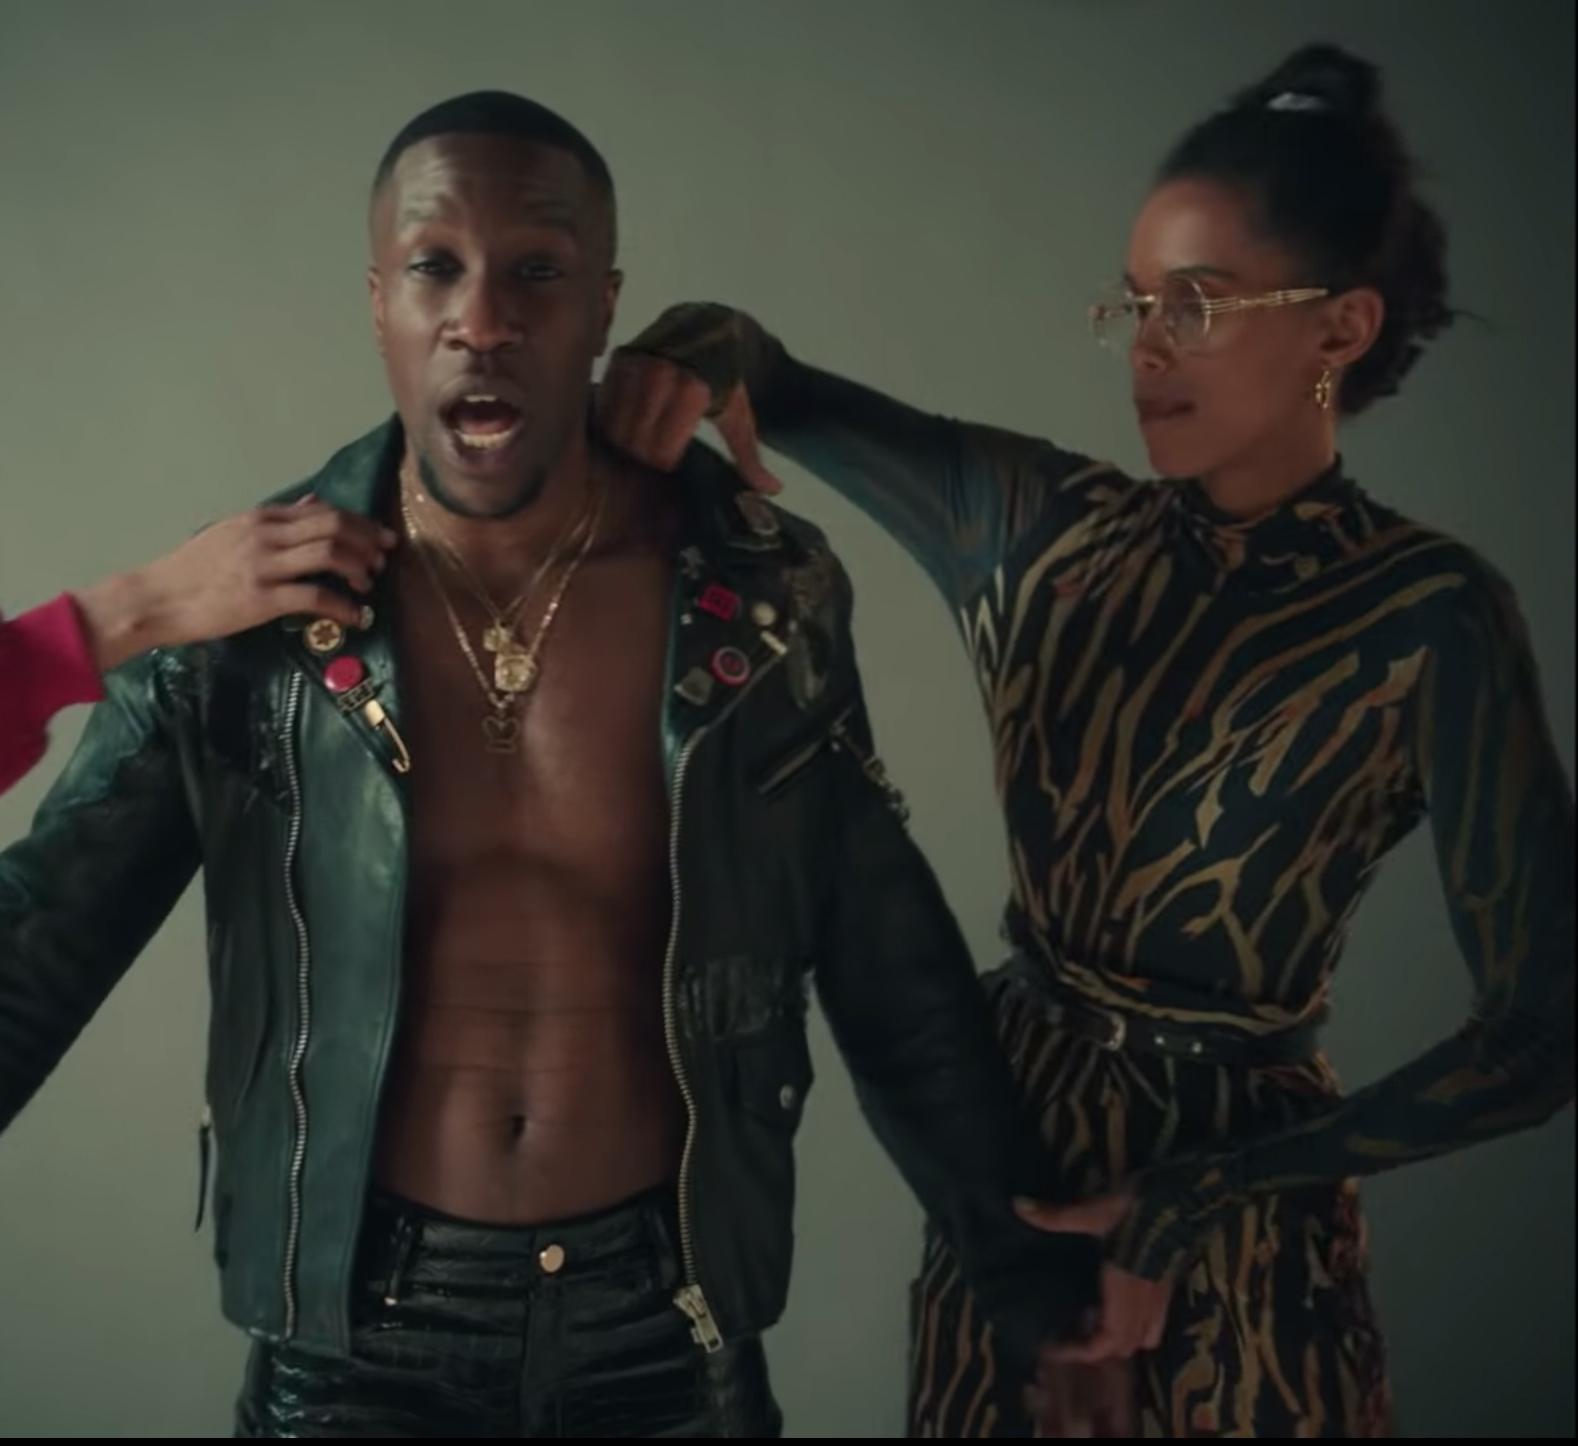 BenjiFlo music video  - Can't Lose